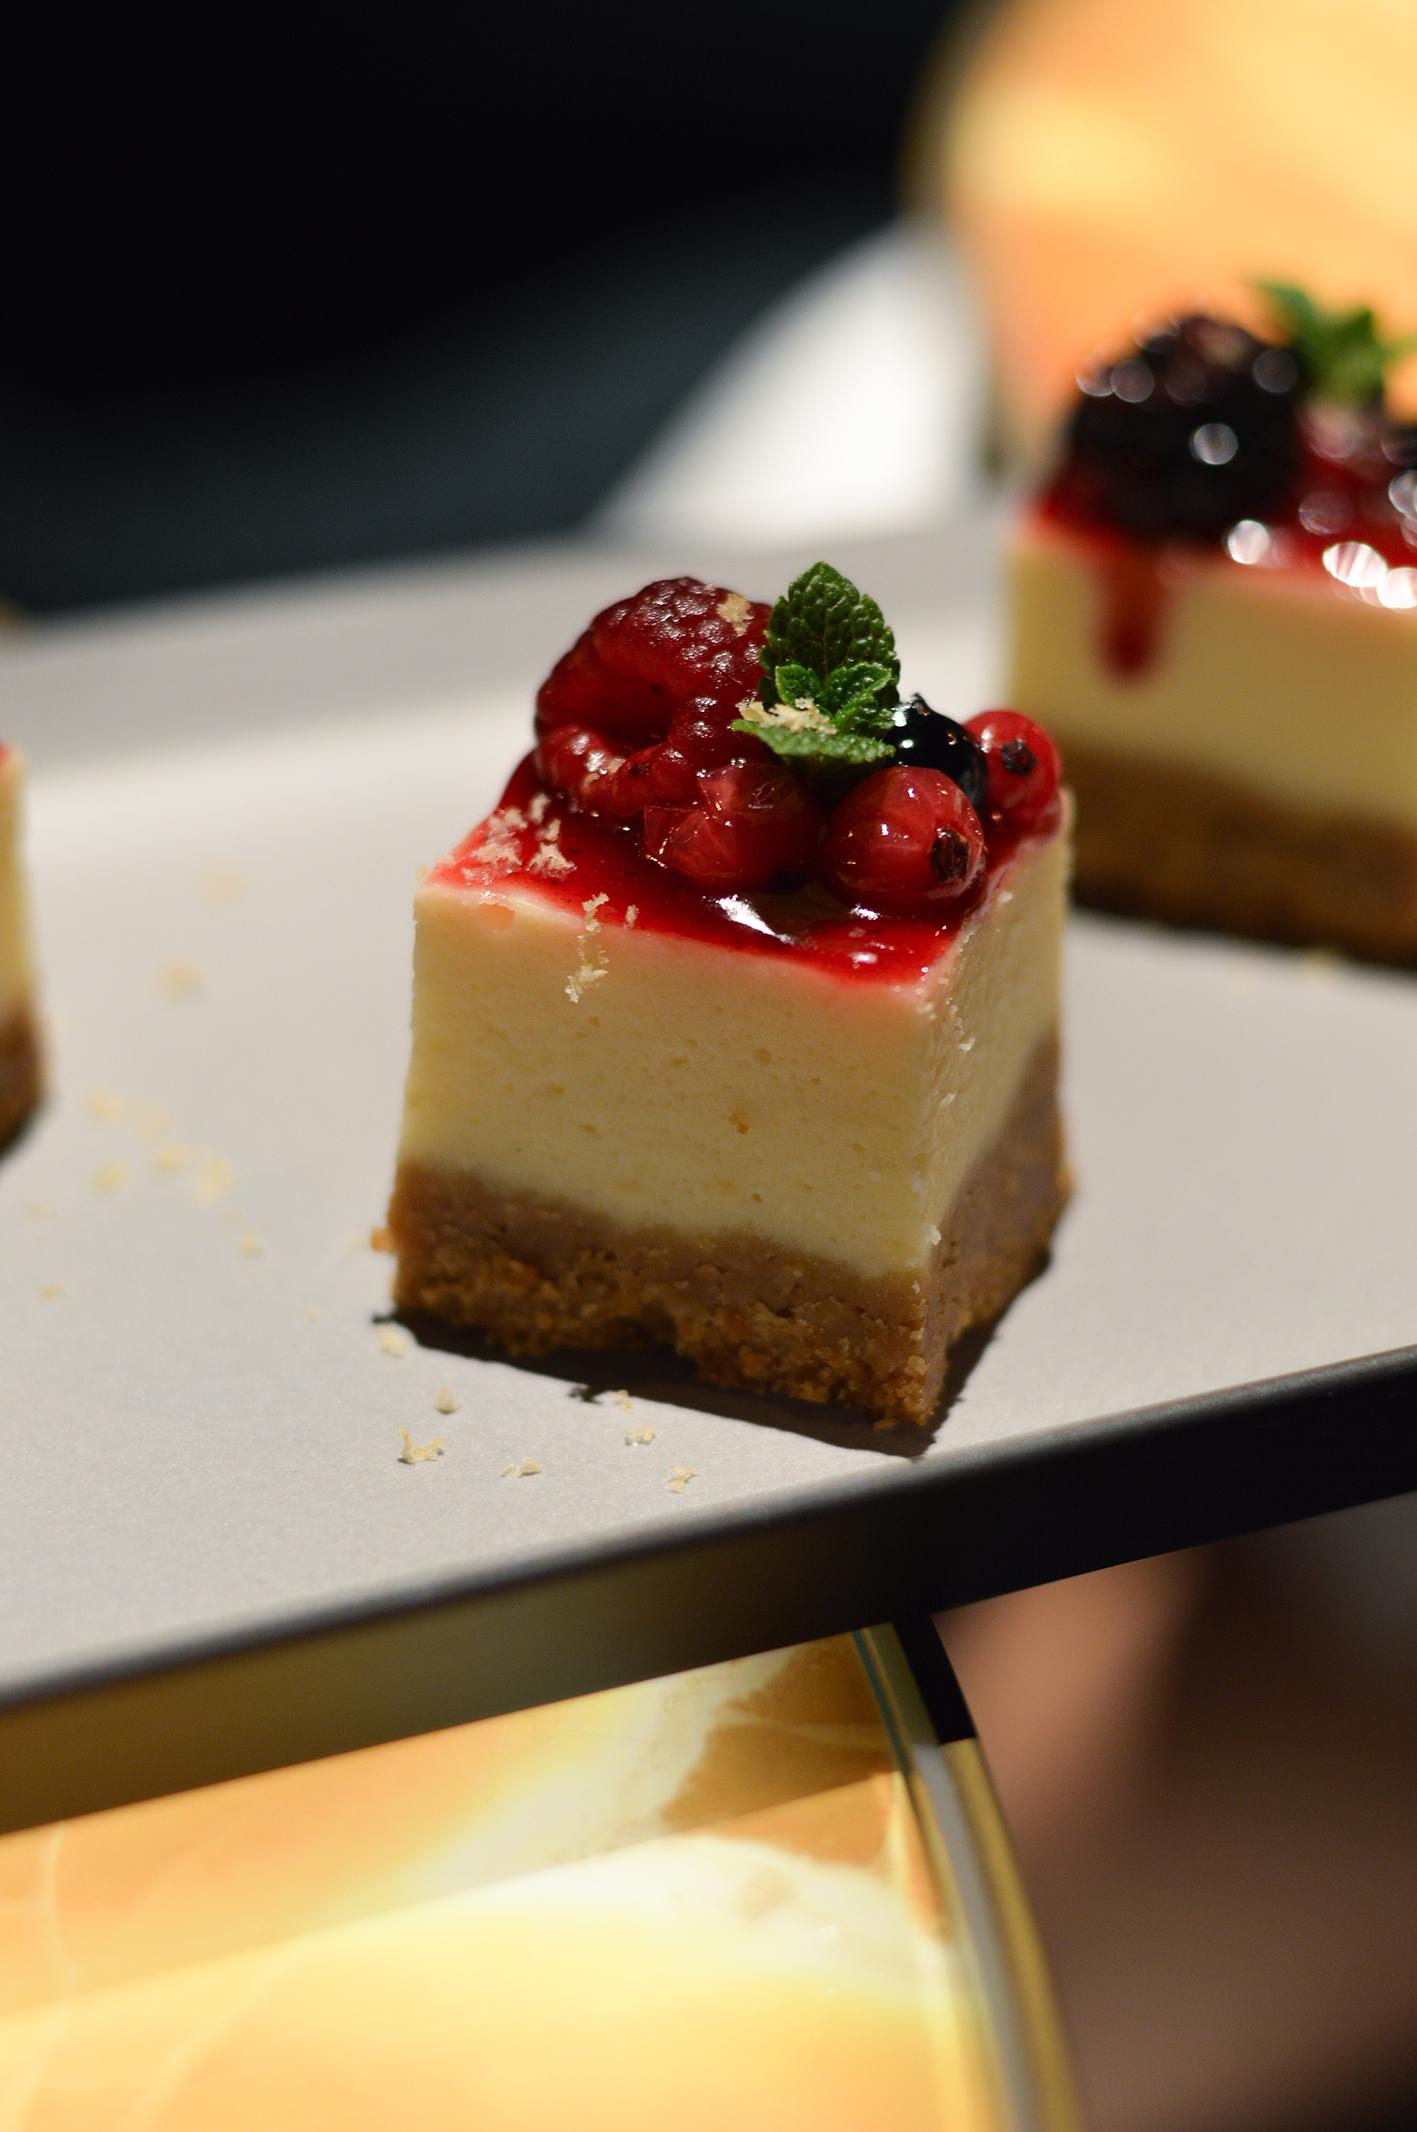 Cheesecake - You Vienna